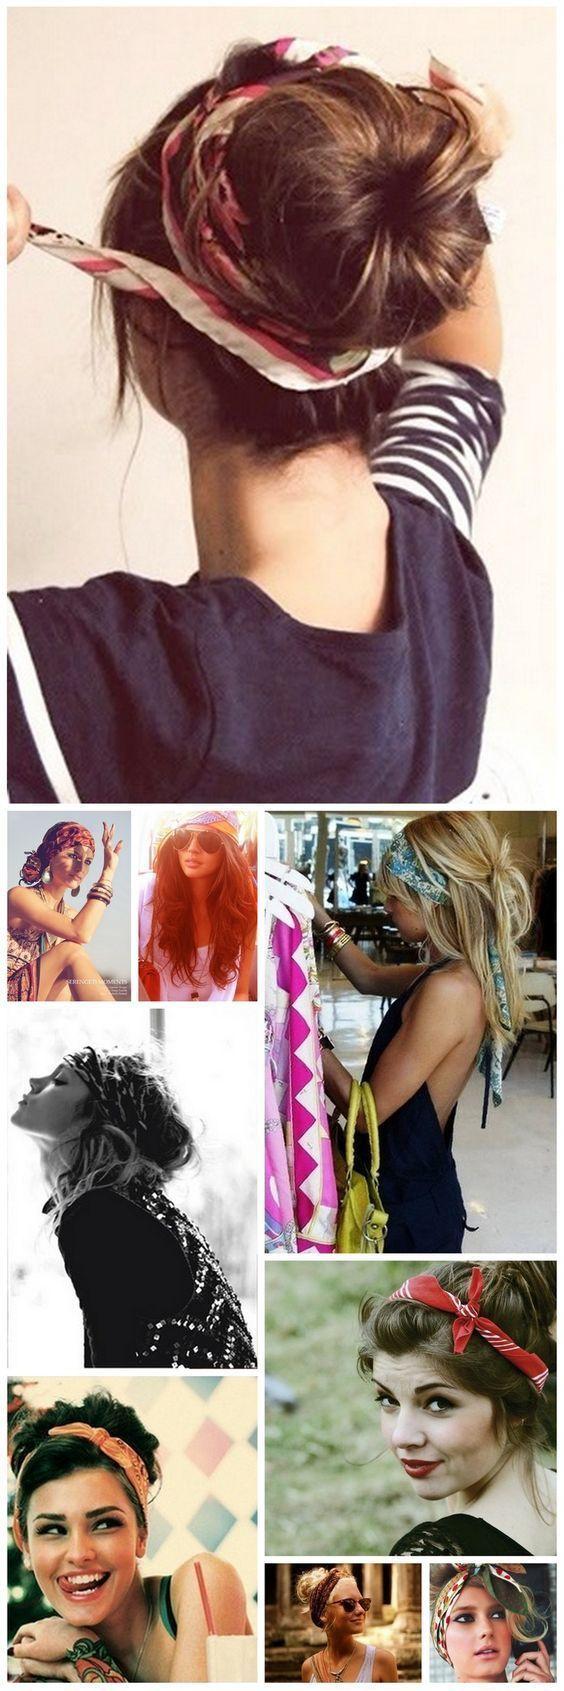 Friseur mit Schal, Kopfschmuck Langhaarschal und mittellangem Haar, … Se coif #coiffure